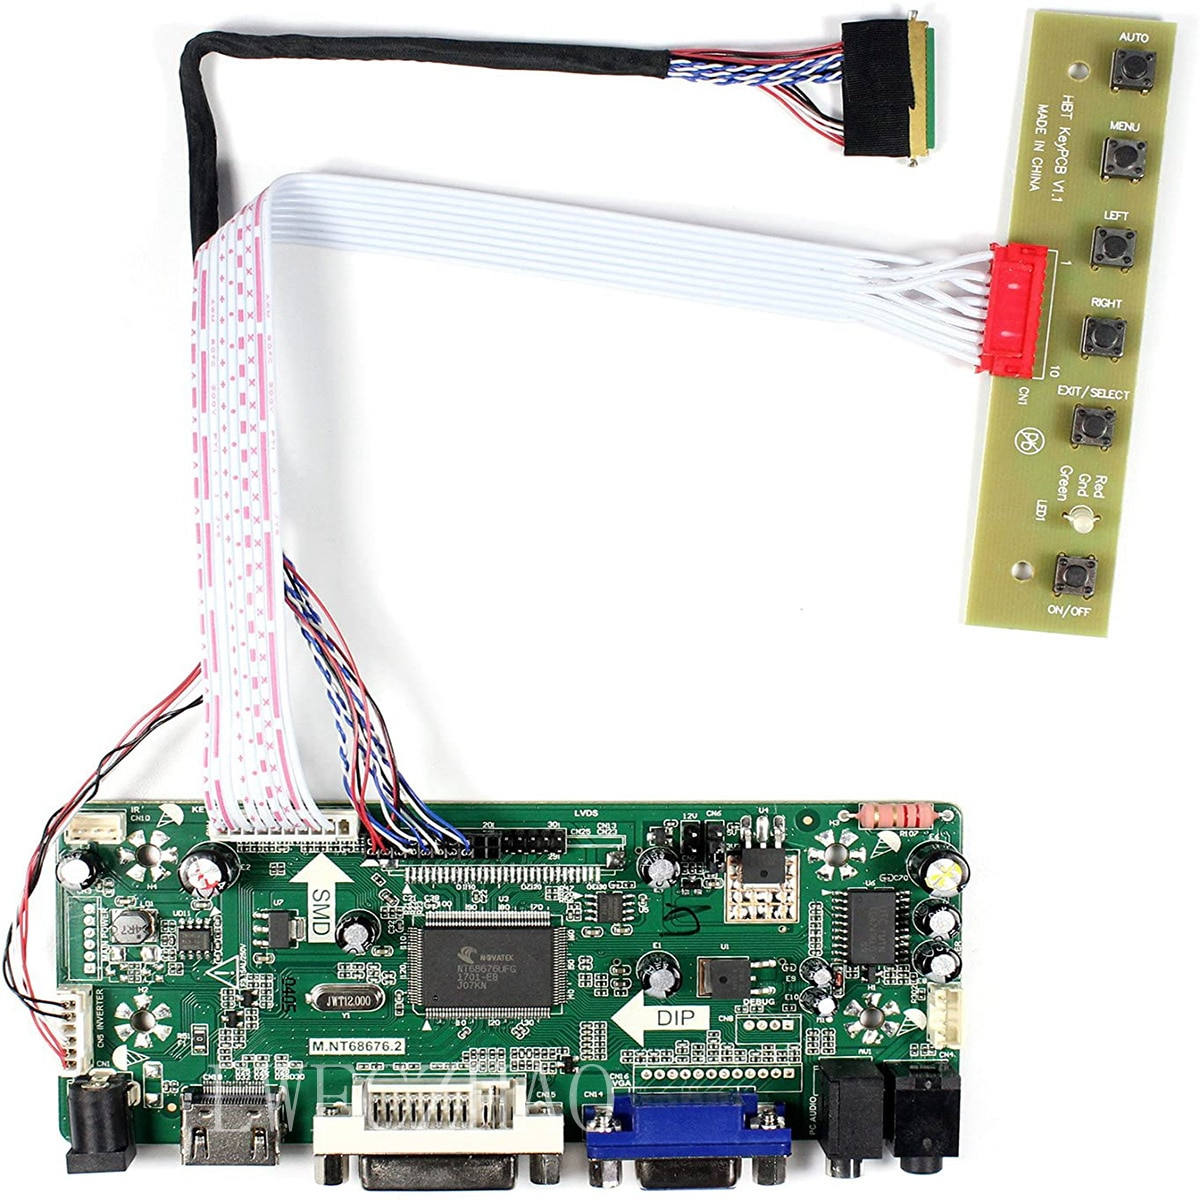 New HDMI+VGA+DVI+Audio M.NT68676 Control driver Board for 15Inch B156HW01 V0 V1 V2 V7 V6 V5 V4 V3 1366X768 LCD Screen panel